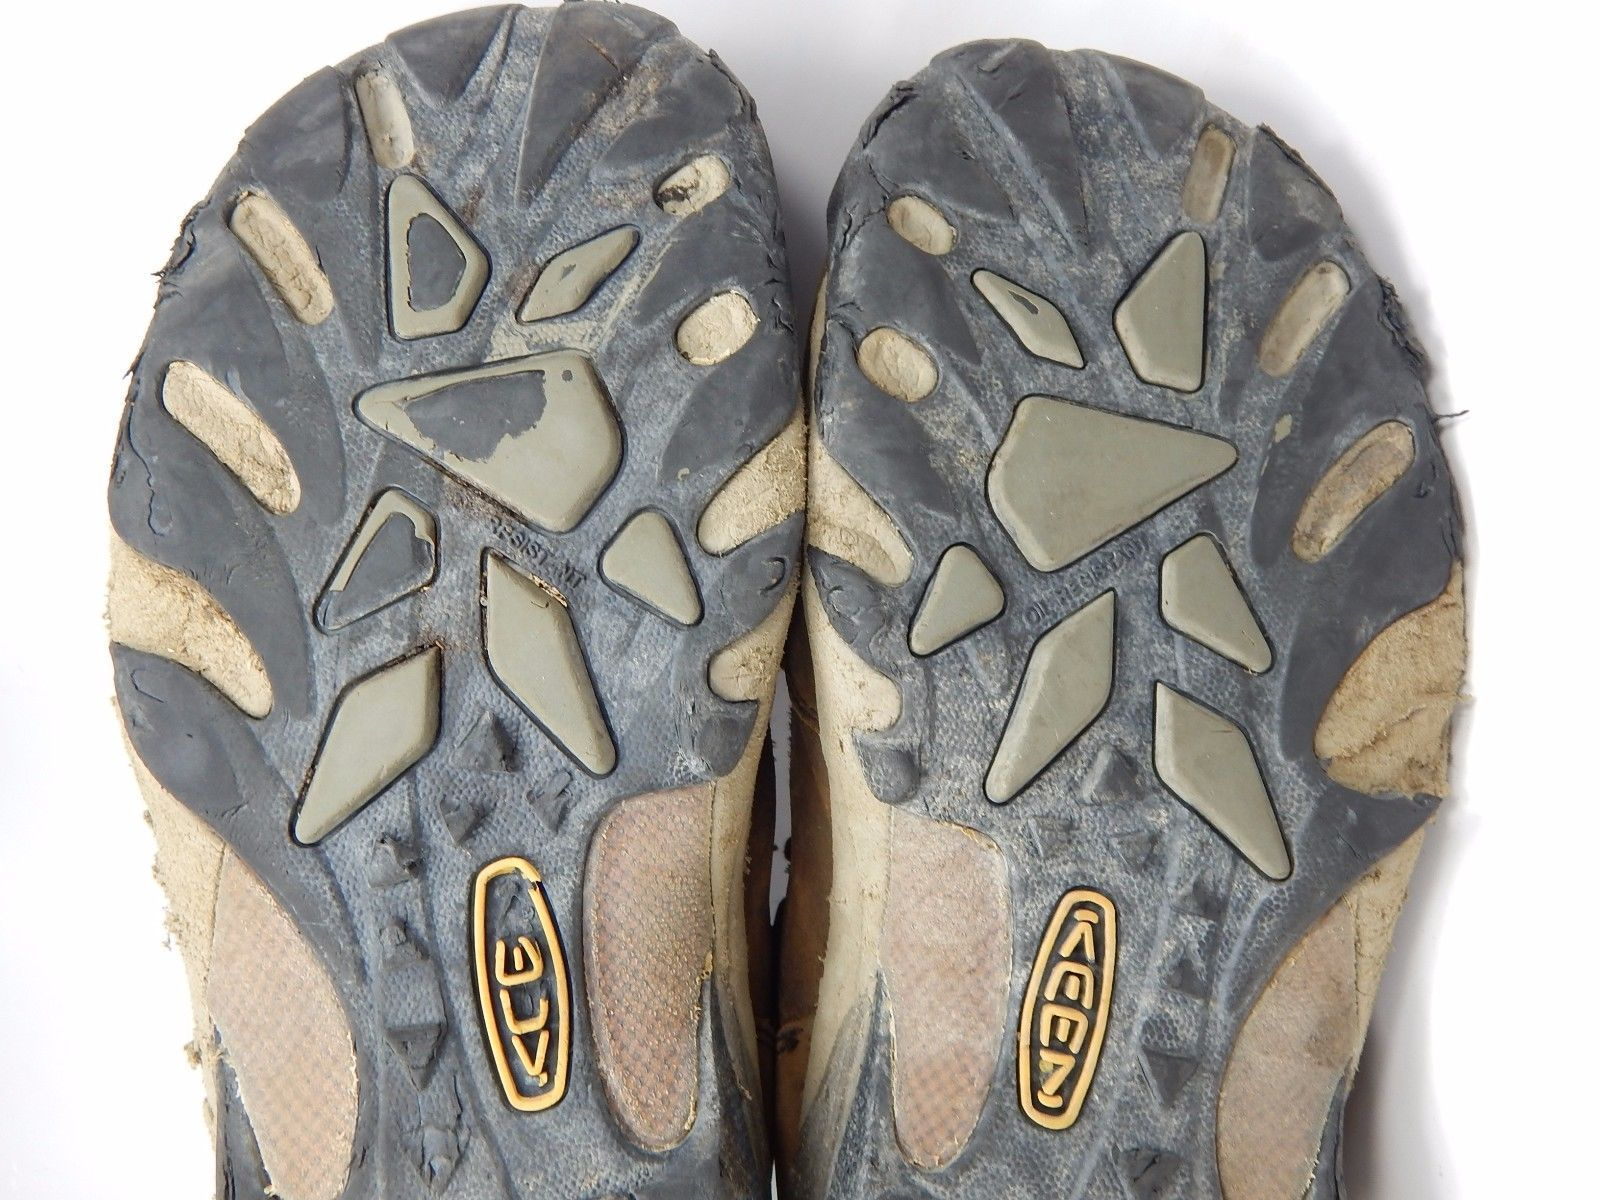 Keen Detroit Mid Top Men's Soft Toe Work Boots Shoes Sz US 9.5 M (D) EU 42.5